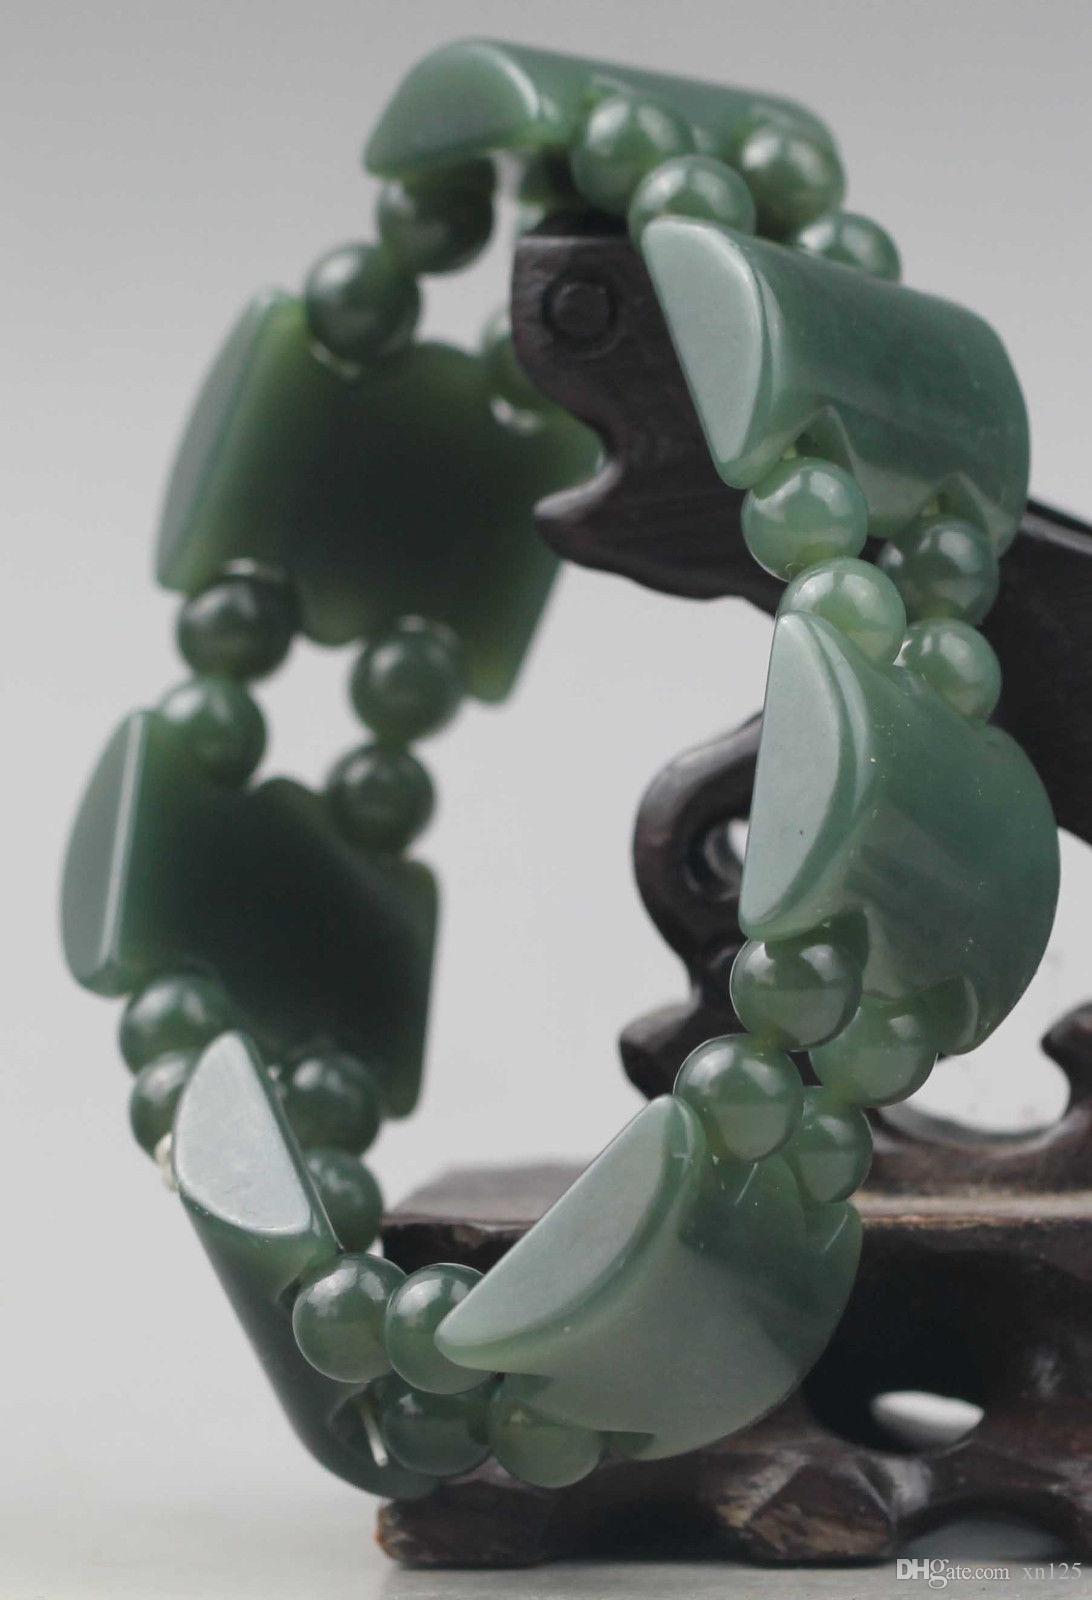 Bracelet en jade de jade de hetian naturel de Chine bracelet jade sculpté à la main NO.C595